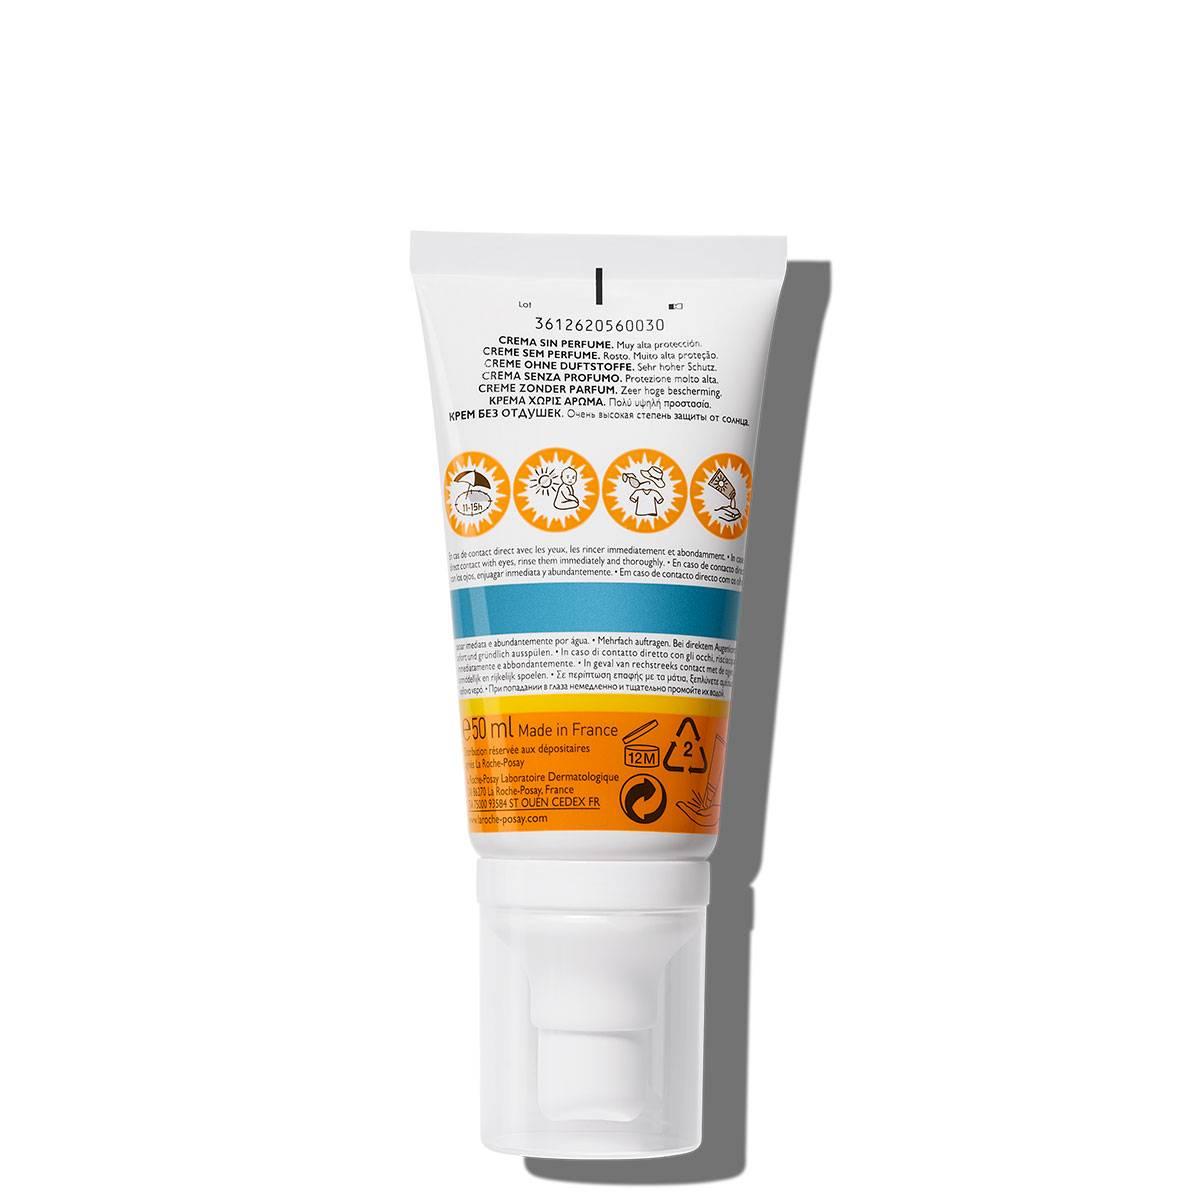 La Roche Posay ProduktSide Sol Anthelios Ultra Ansigt Spf50 50ml Fragran